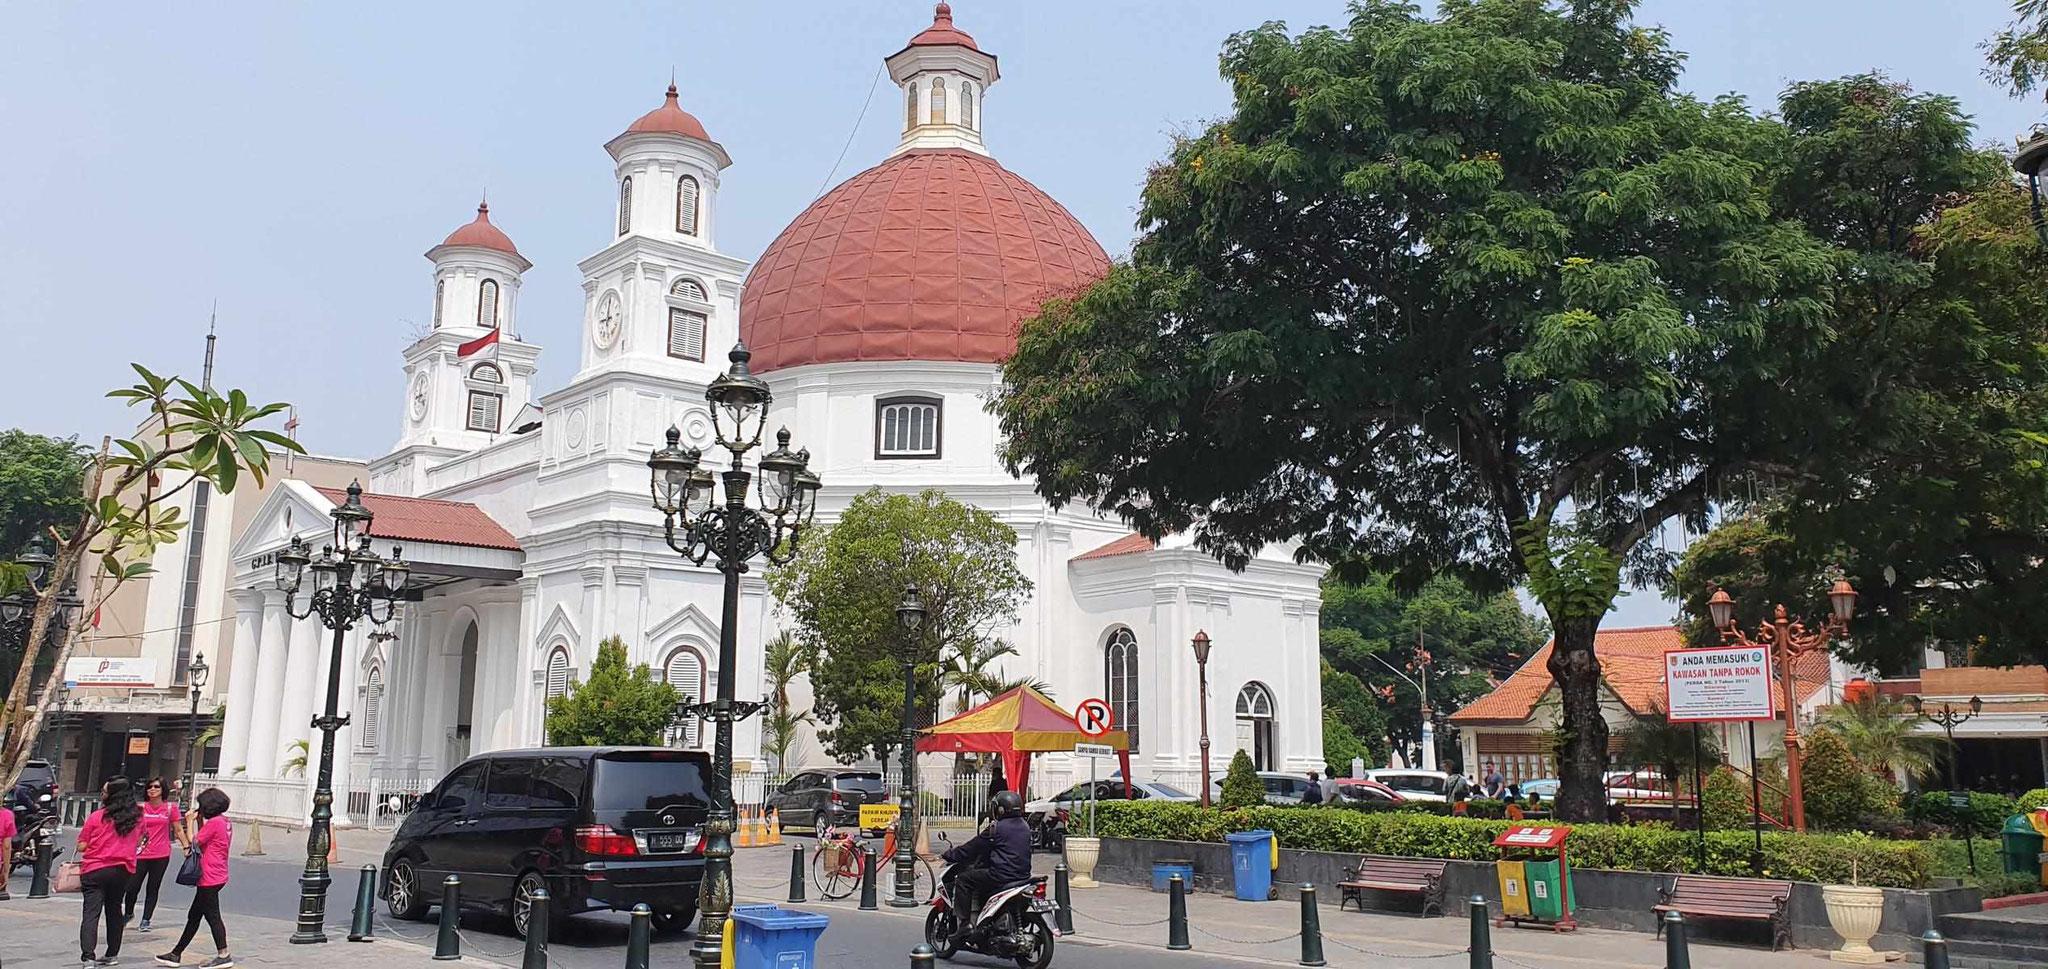 Altstadt mit der Kirche Gereja Blenduk